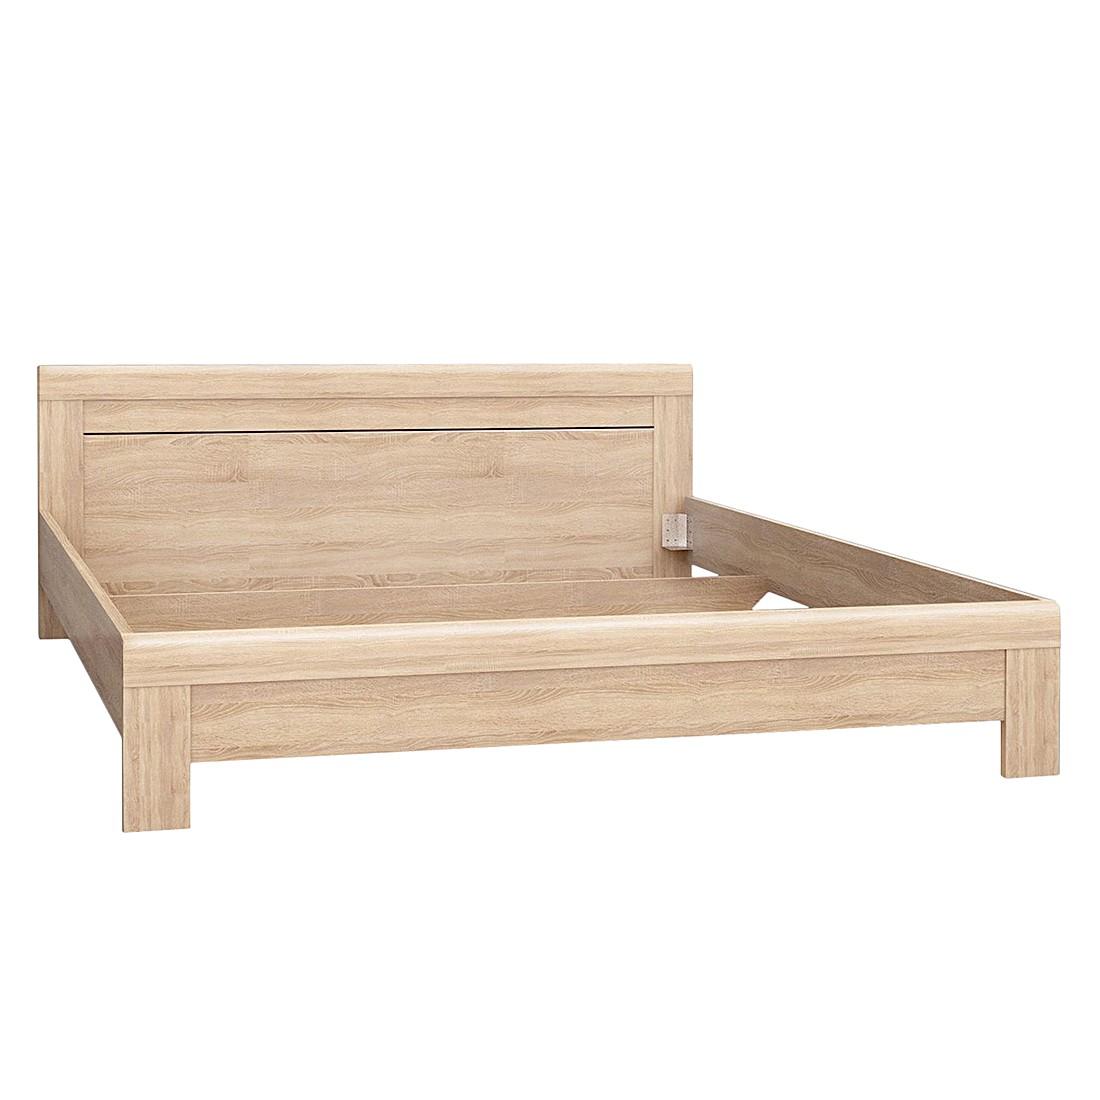 bett parla eiche sonoma dekor mooved m f3 000187 isso m bel. Black Bedroom Furniture Sets. Home Design Ideas